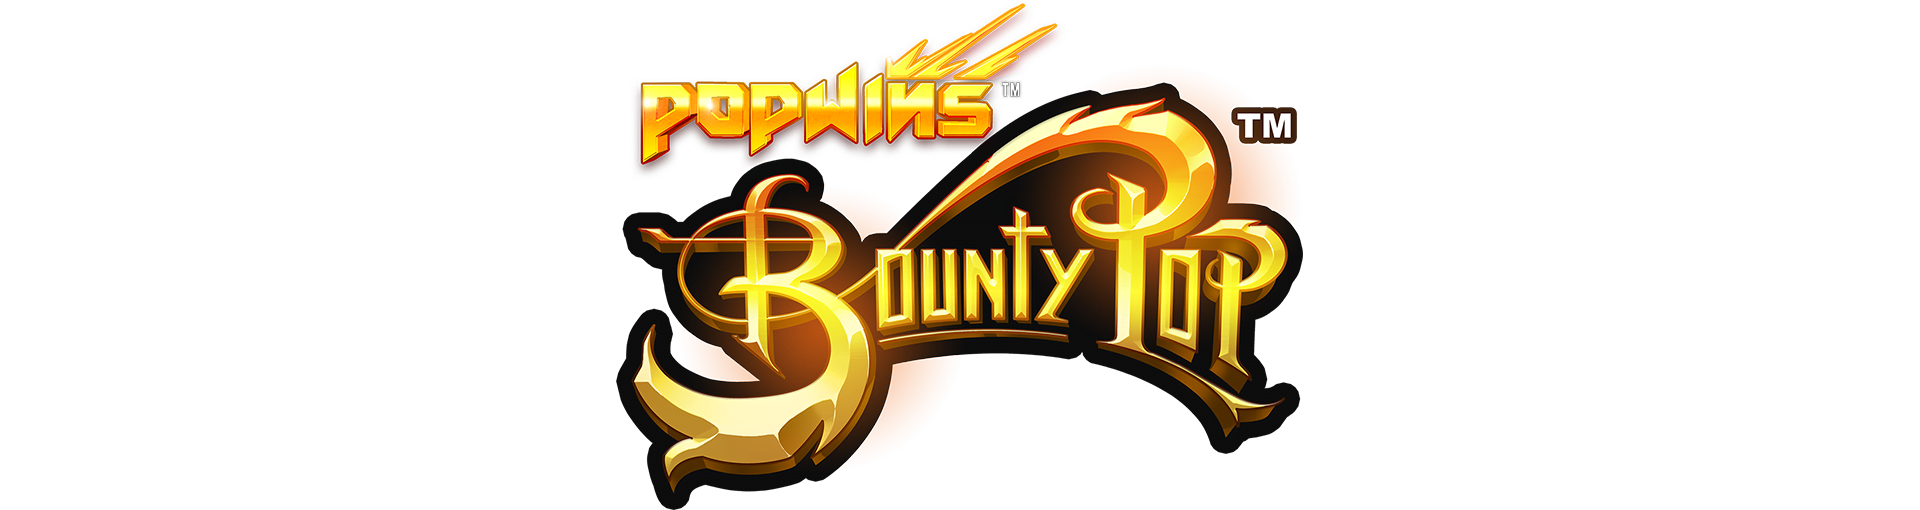 Yggdrasil-upcoming-game-LOGO-BountyPOP-logo